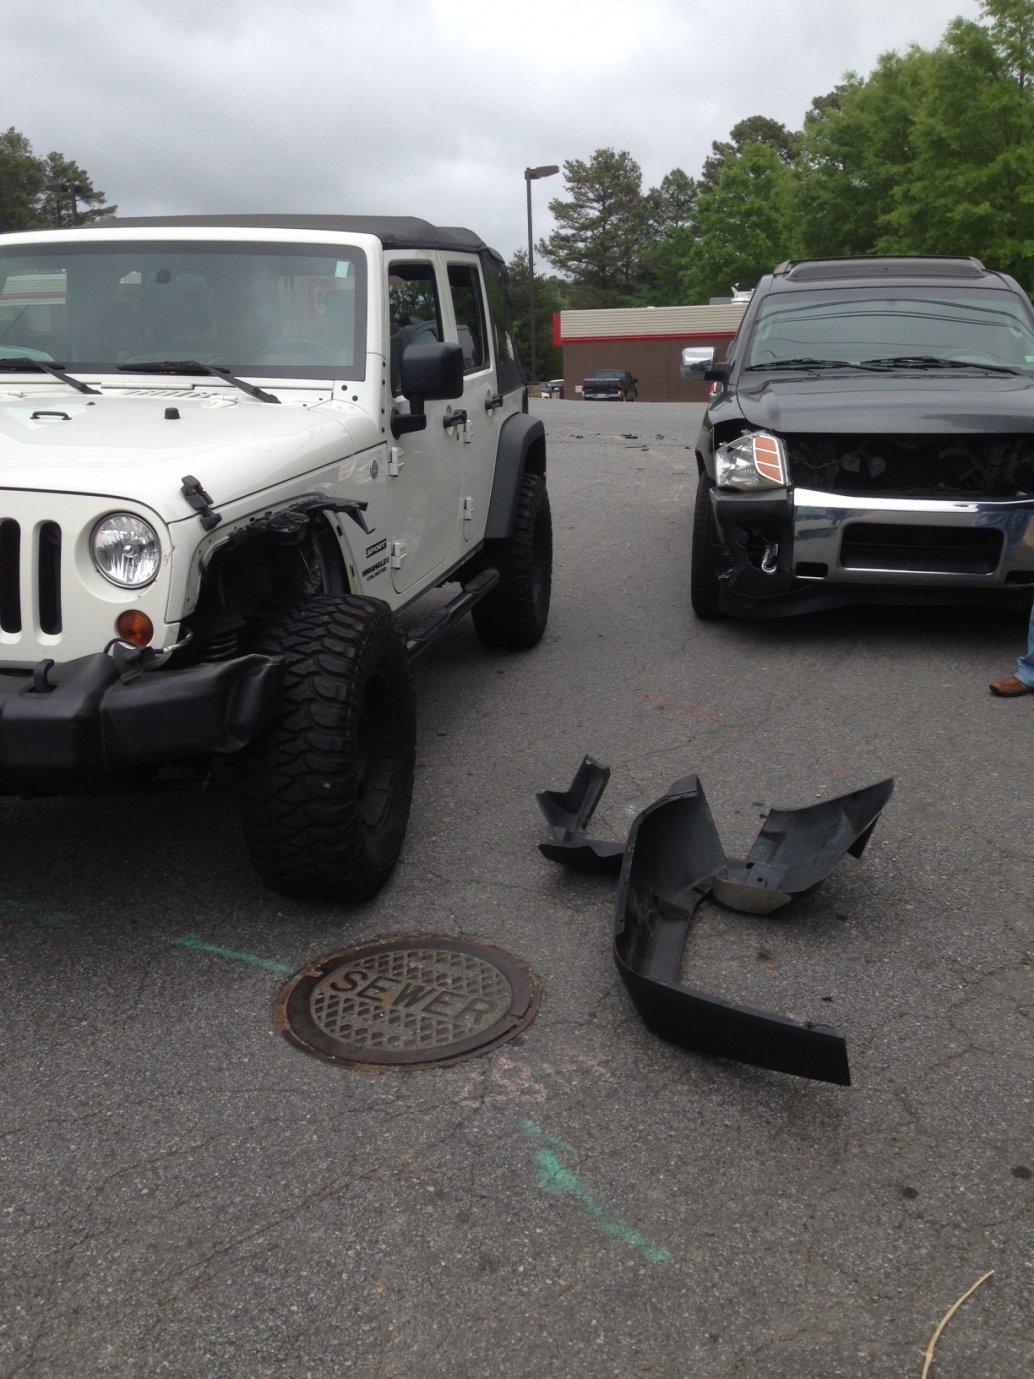 jeep-wreck-5-3-2013.jpg